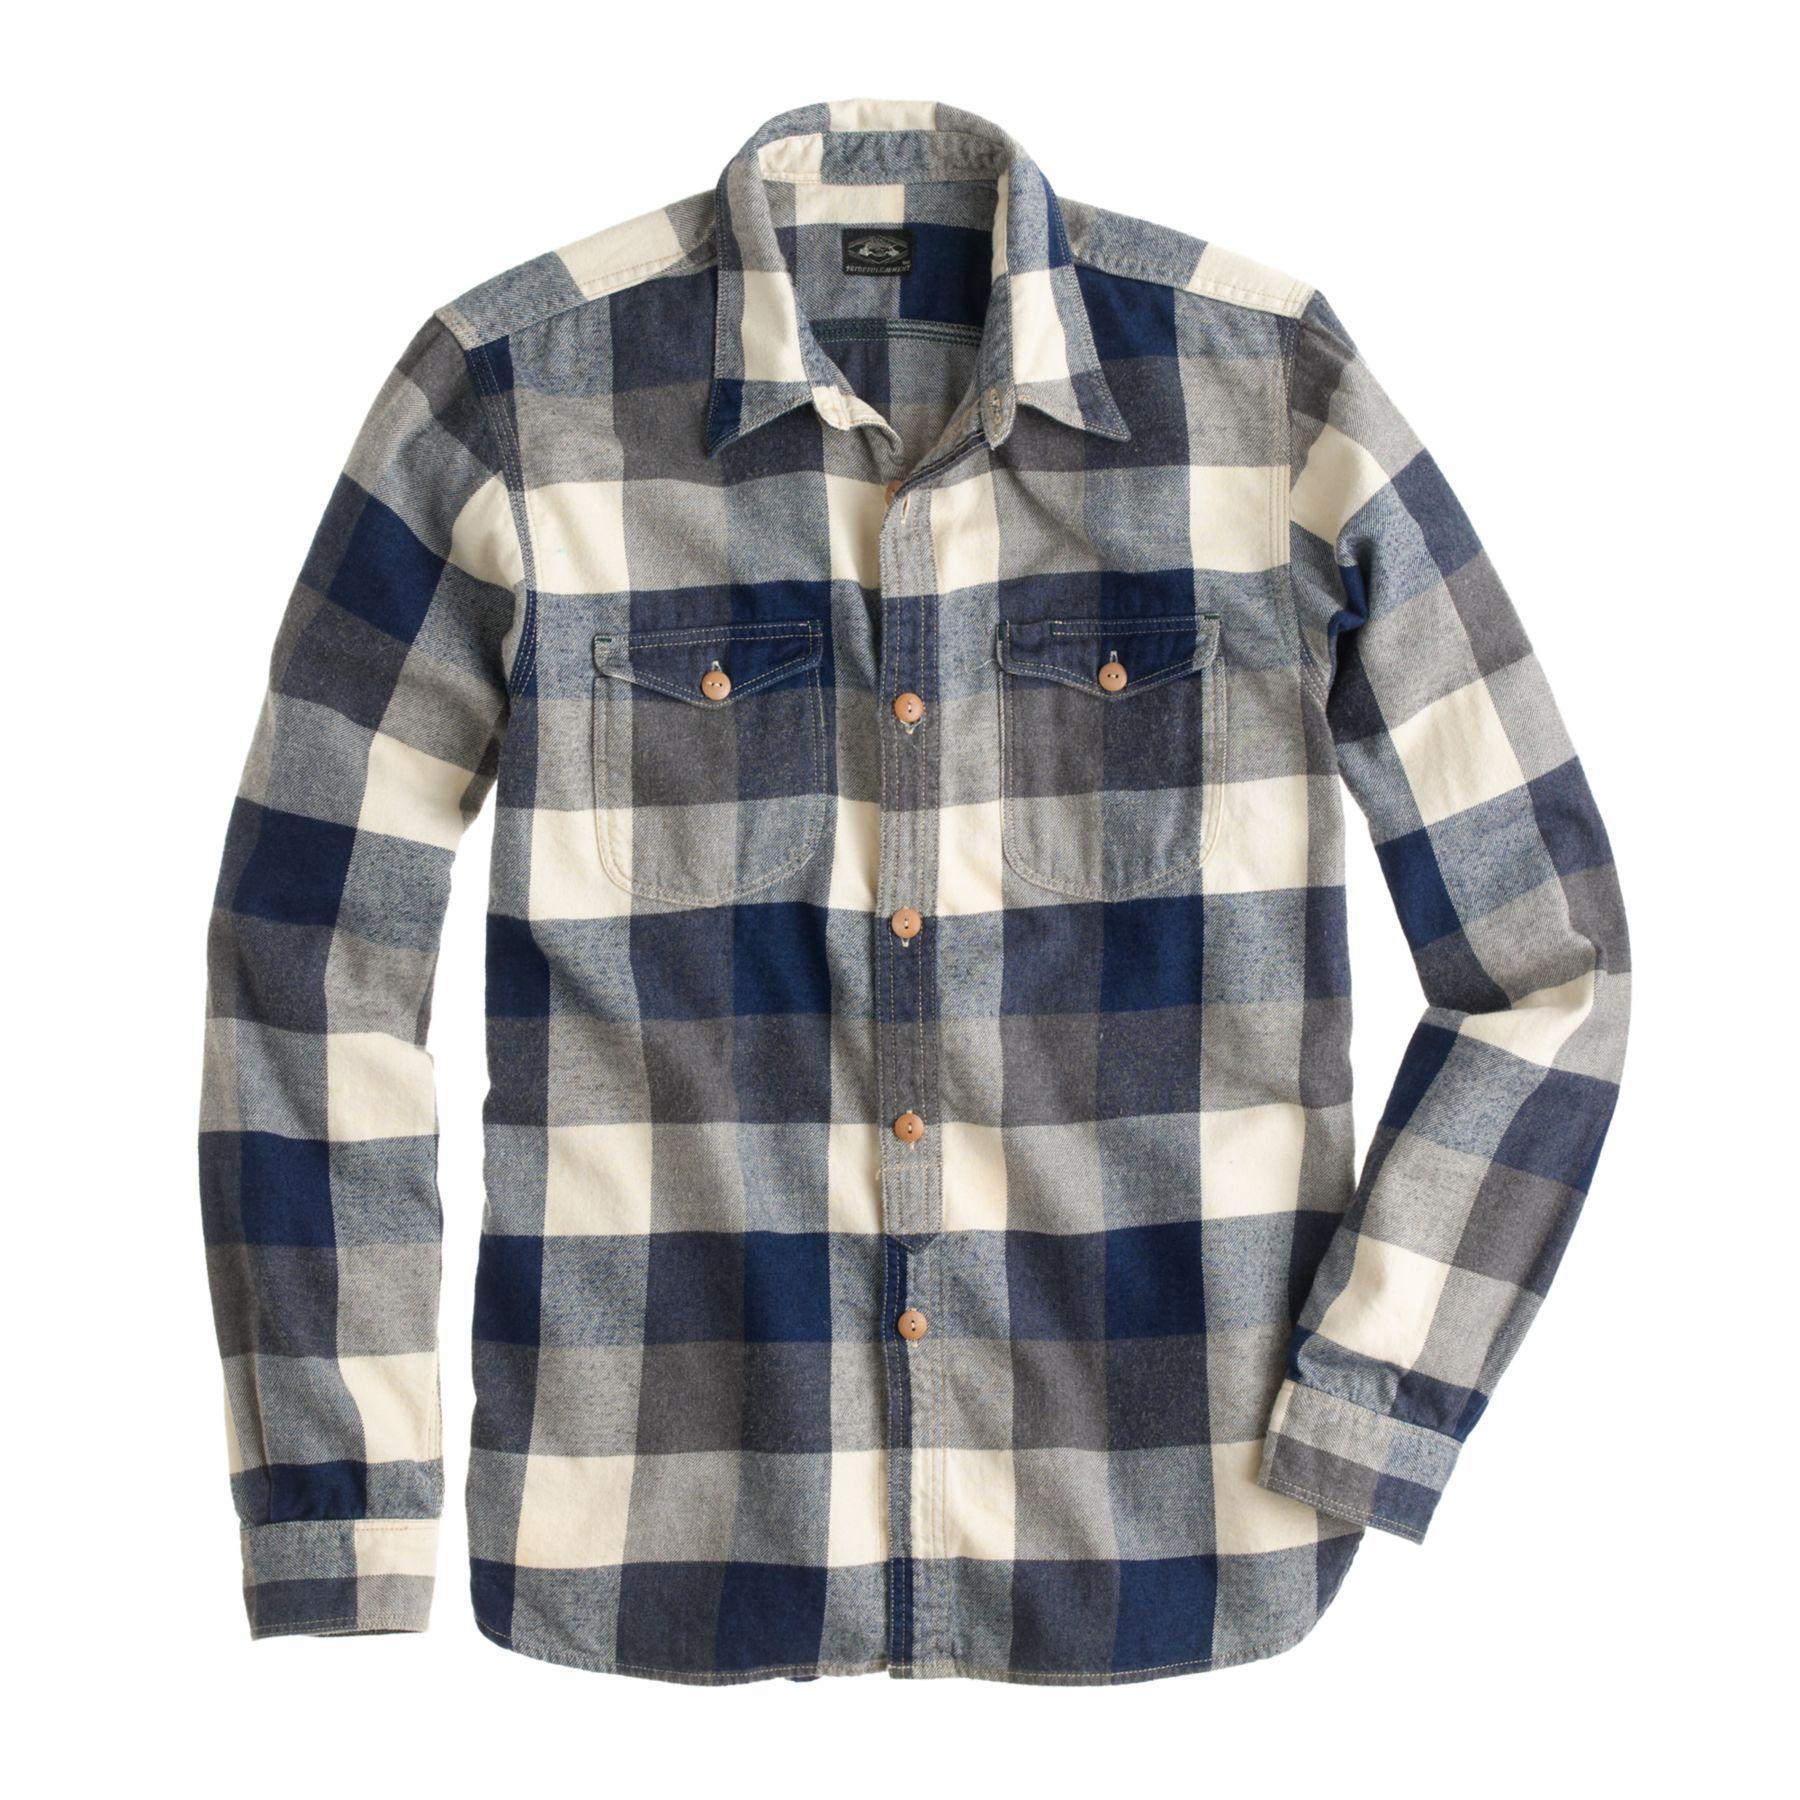 Flannel shirt men outfit  JCrew menus shuttle notes indigo buffalo flannel shirt  style